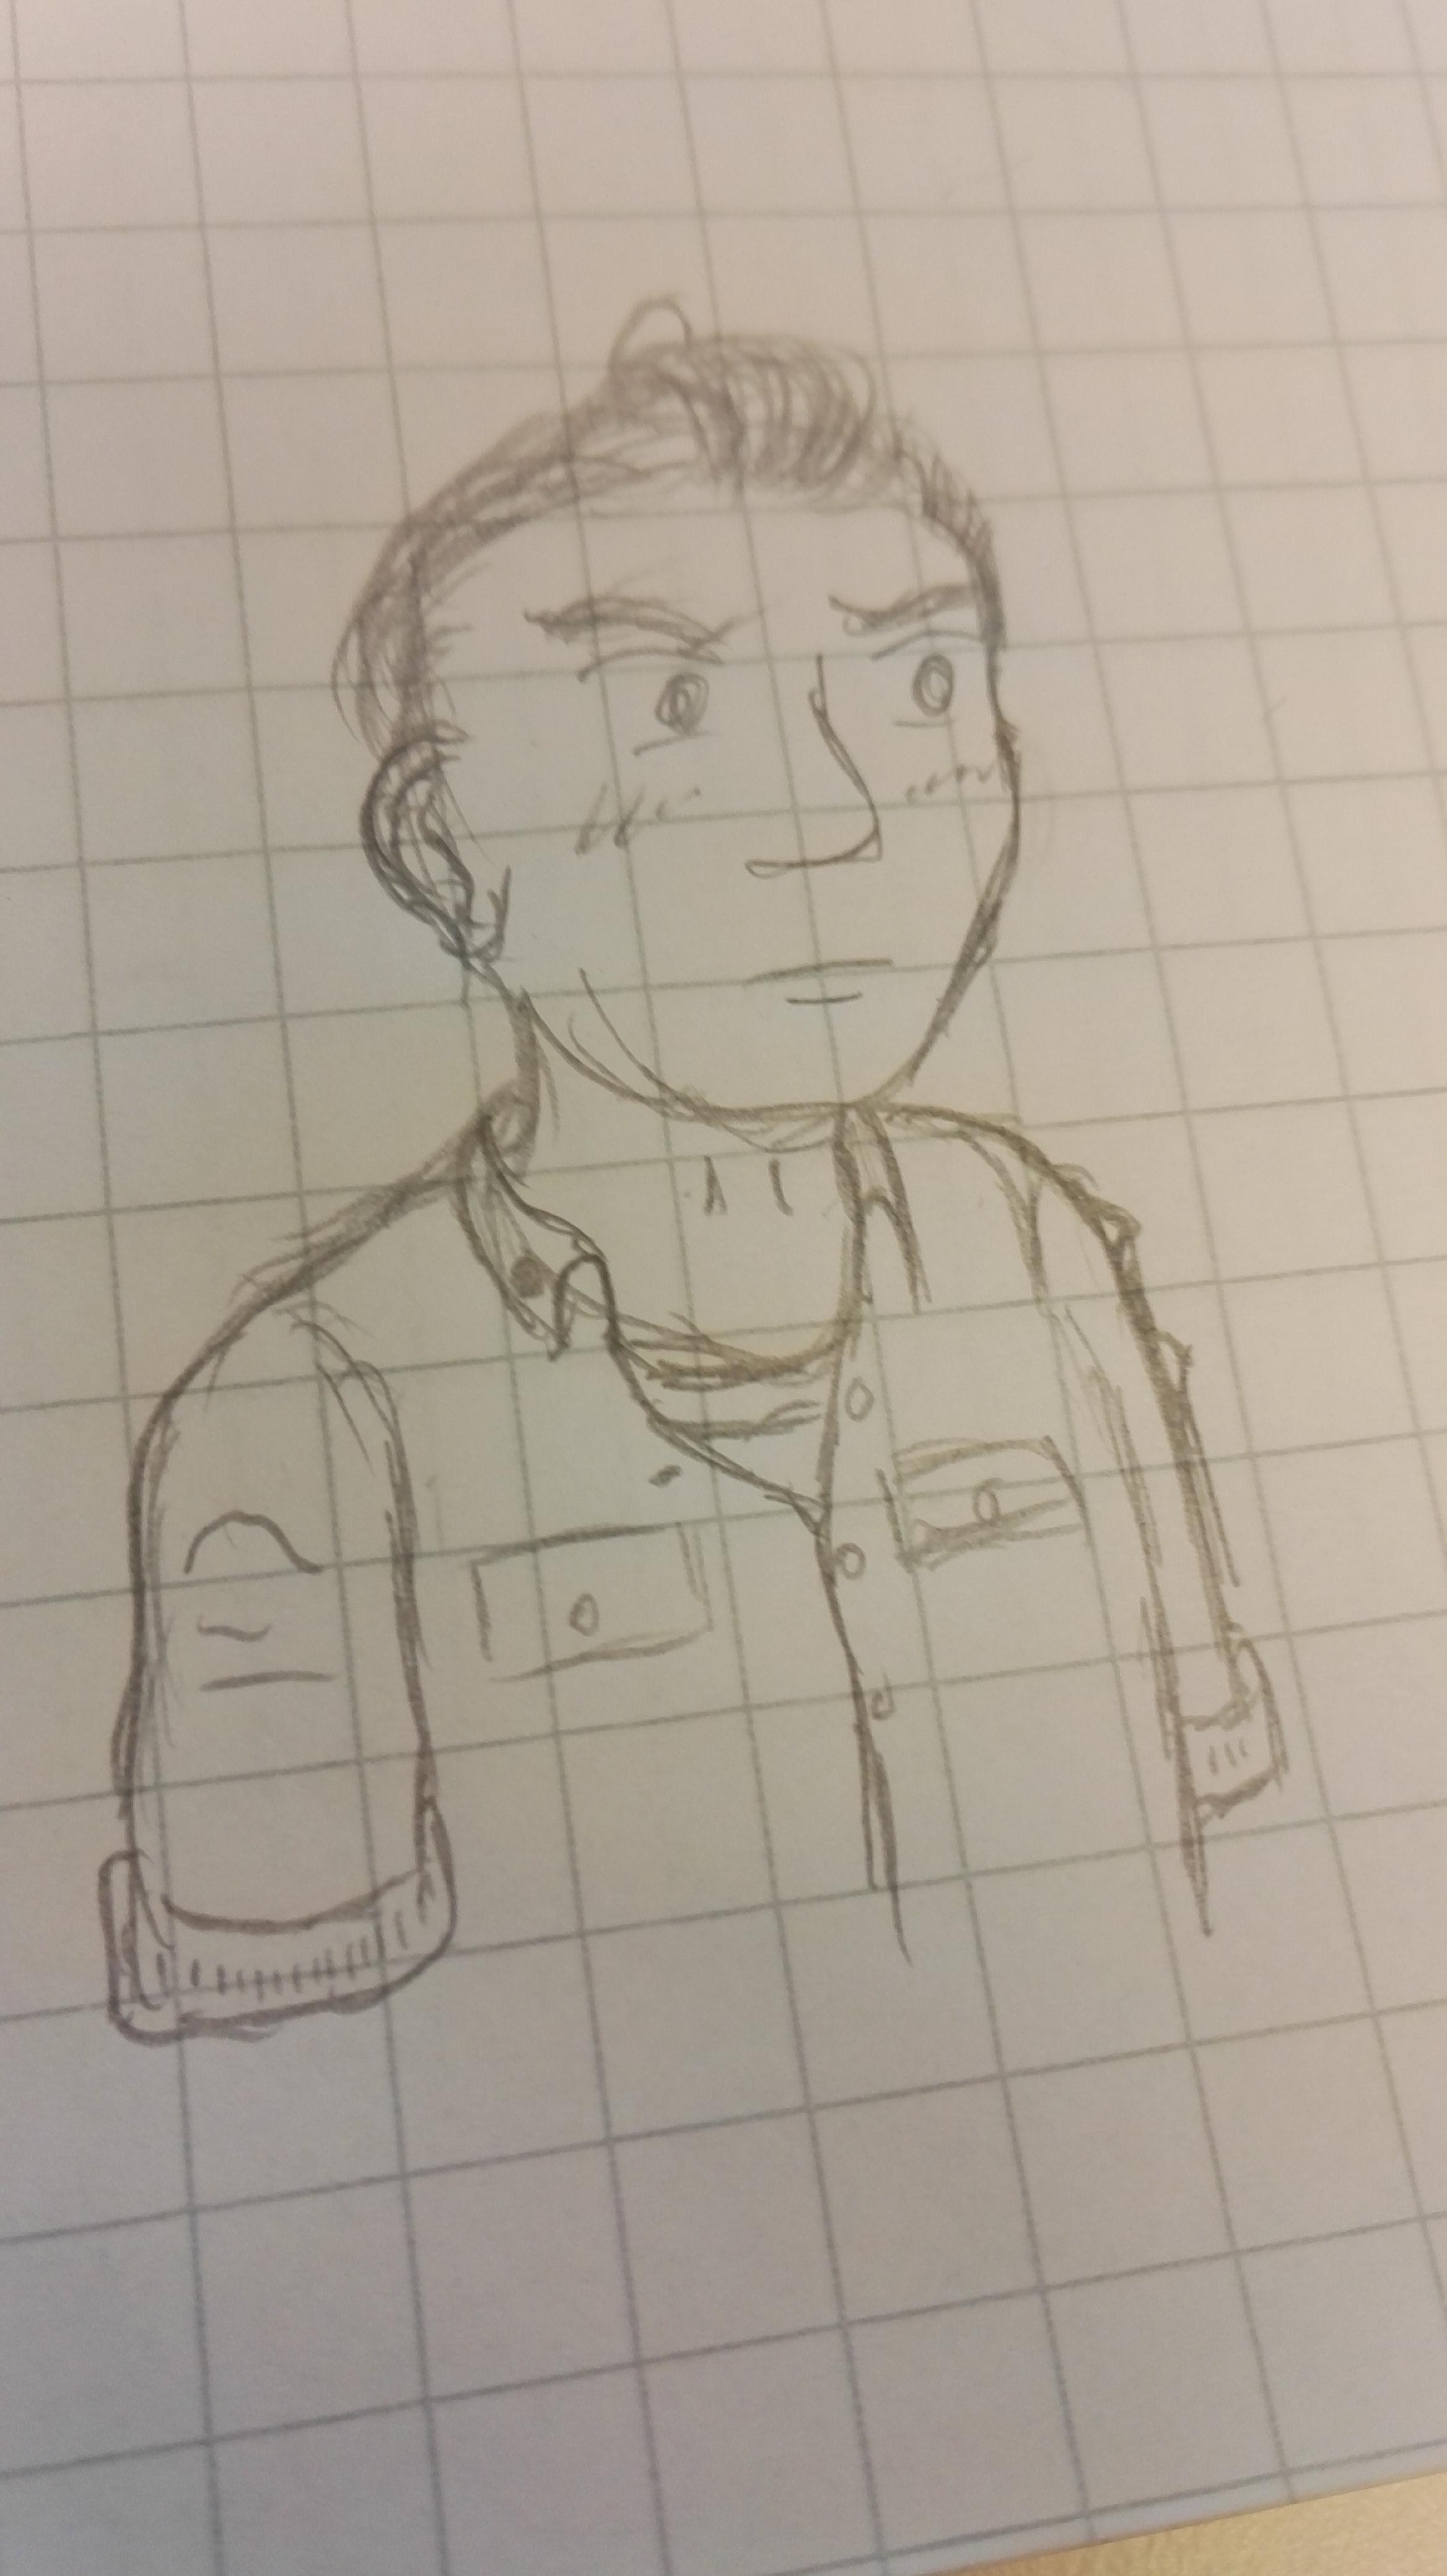 Random doodle by WHAMtheMAN